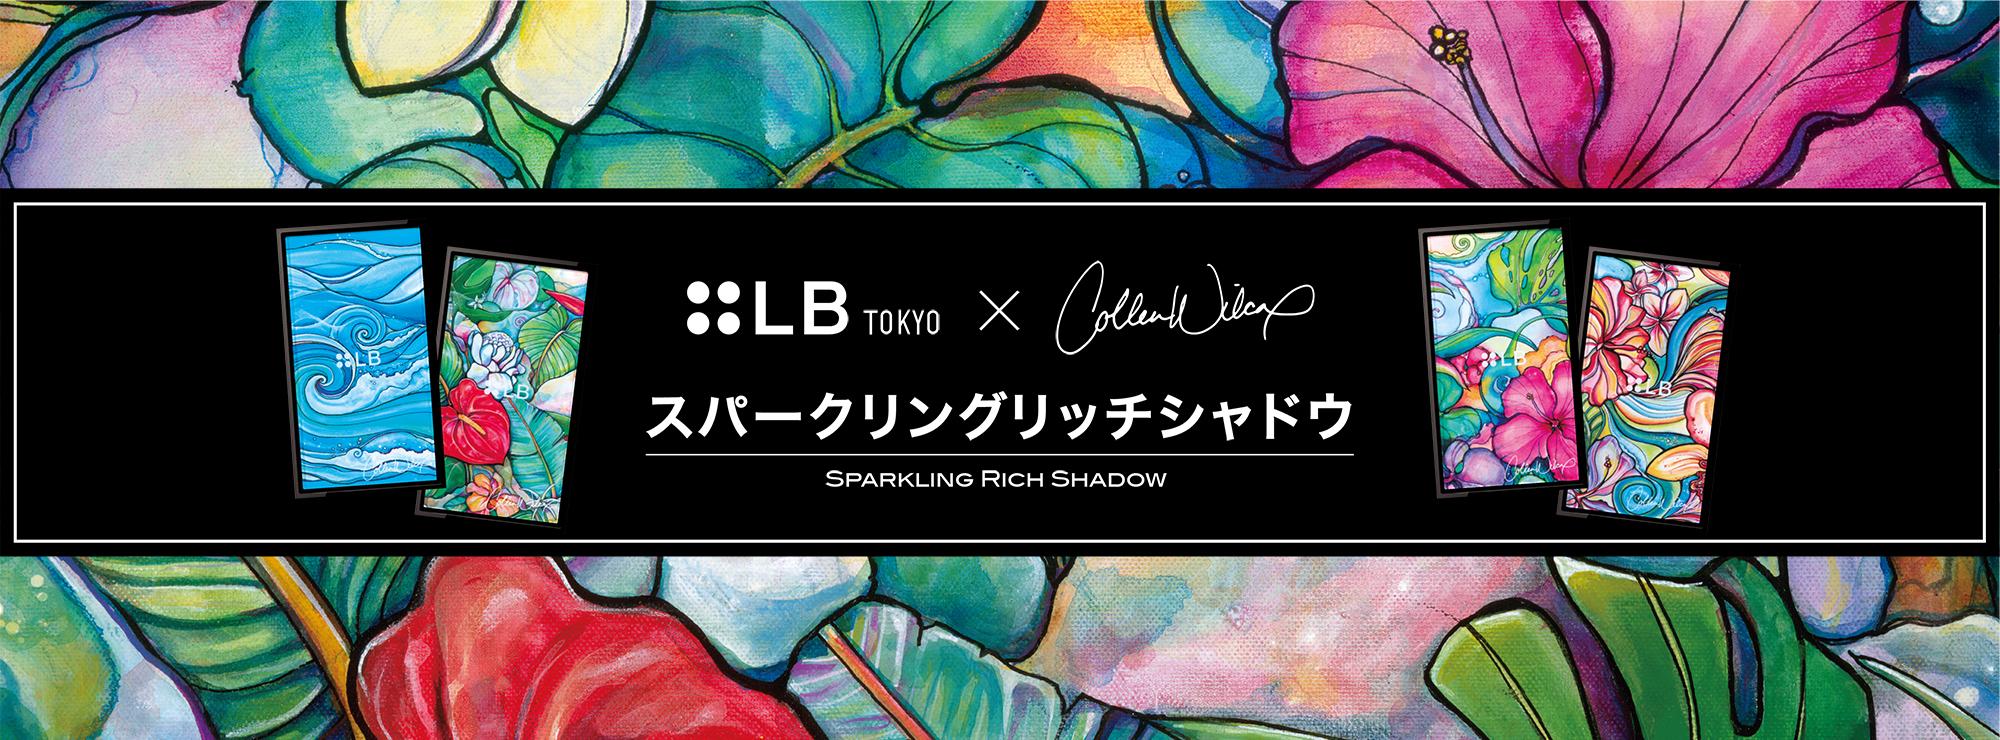 LB_2100x1126_SparklingRichShadow_PC.jpg